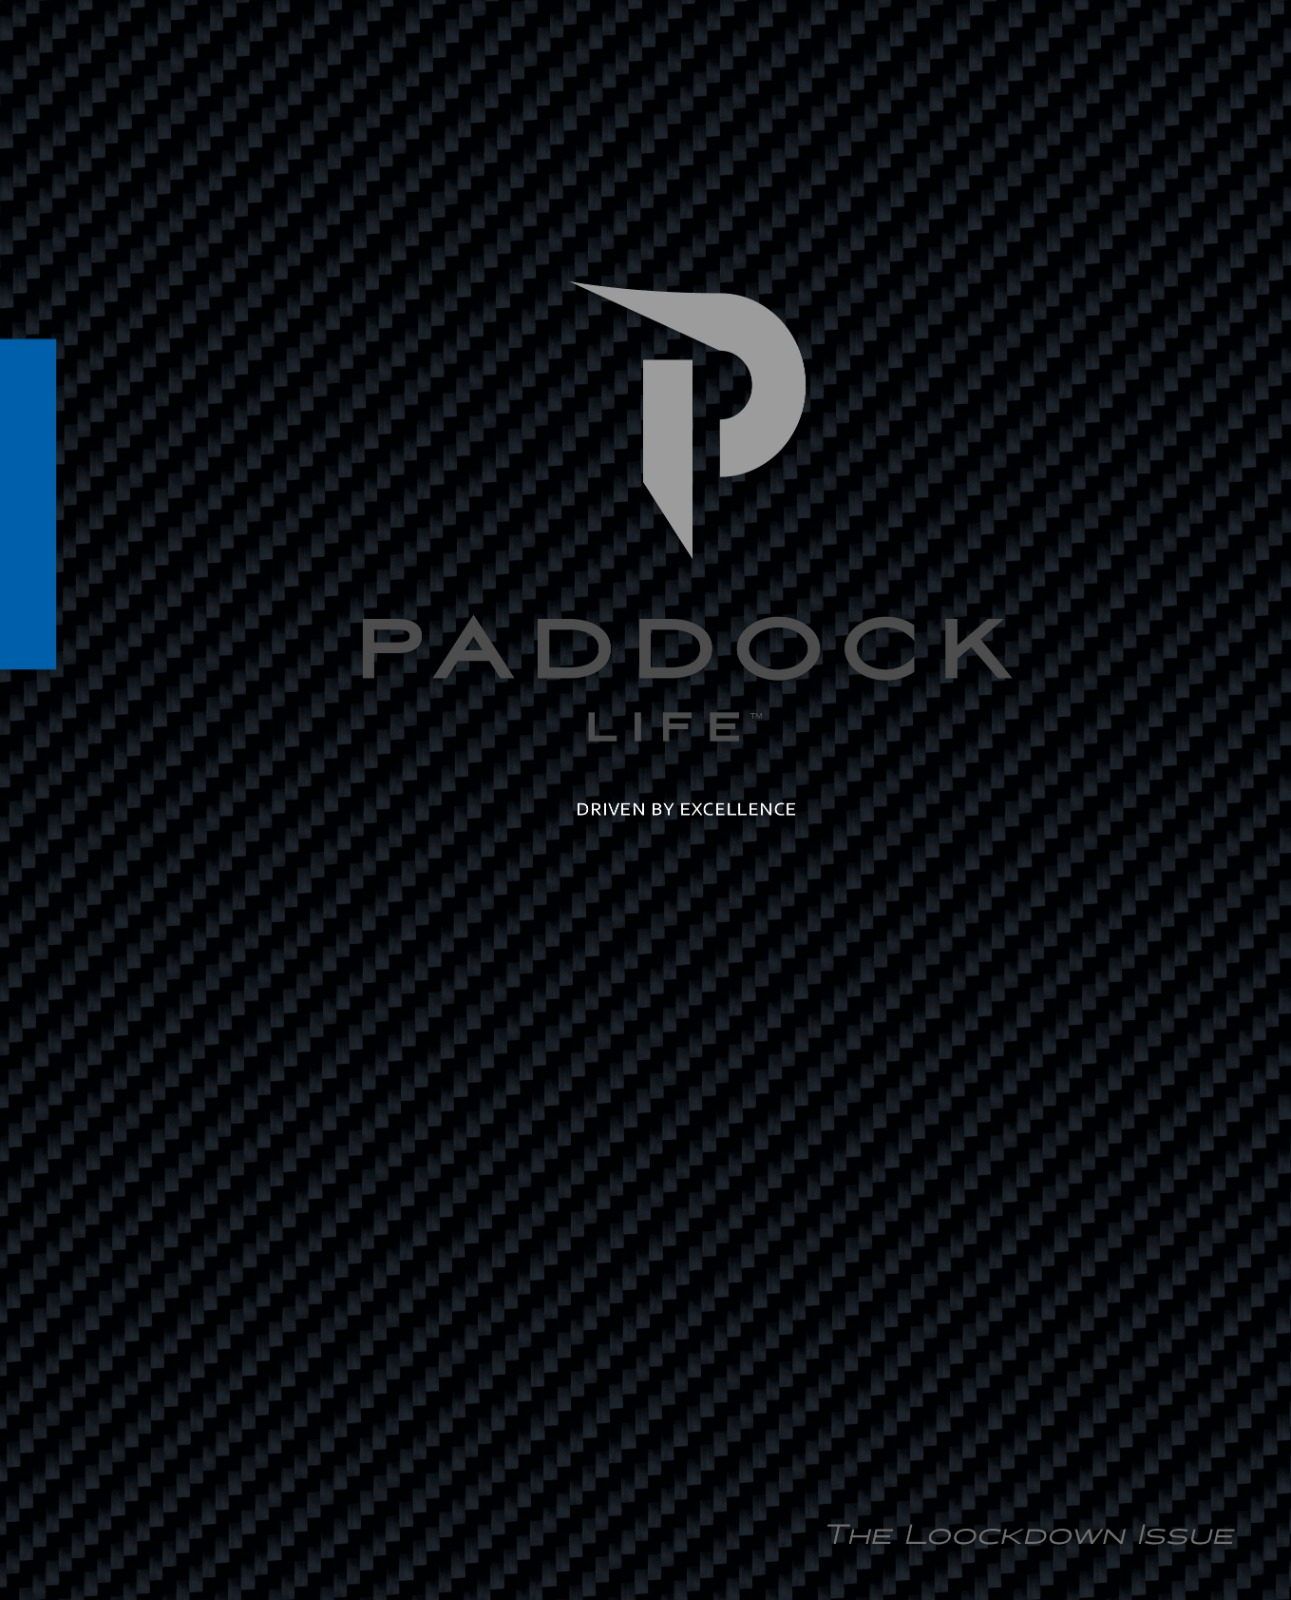 Paddock Life Issue 15 Lockdown